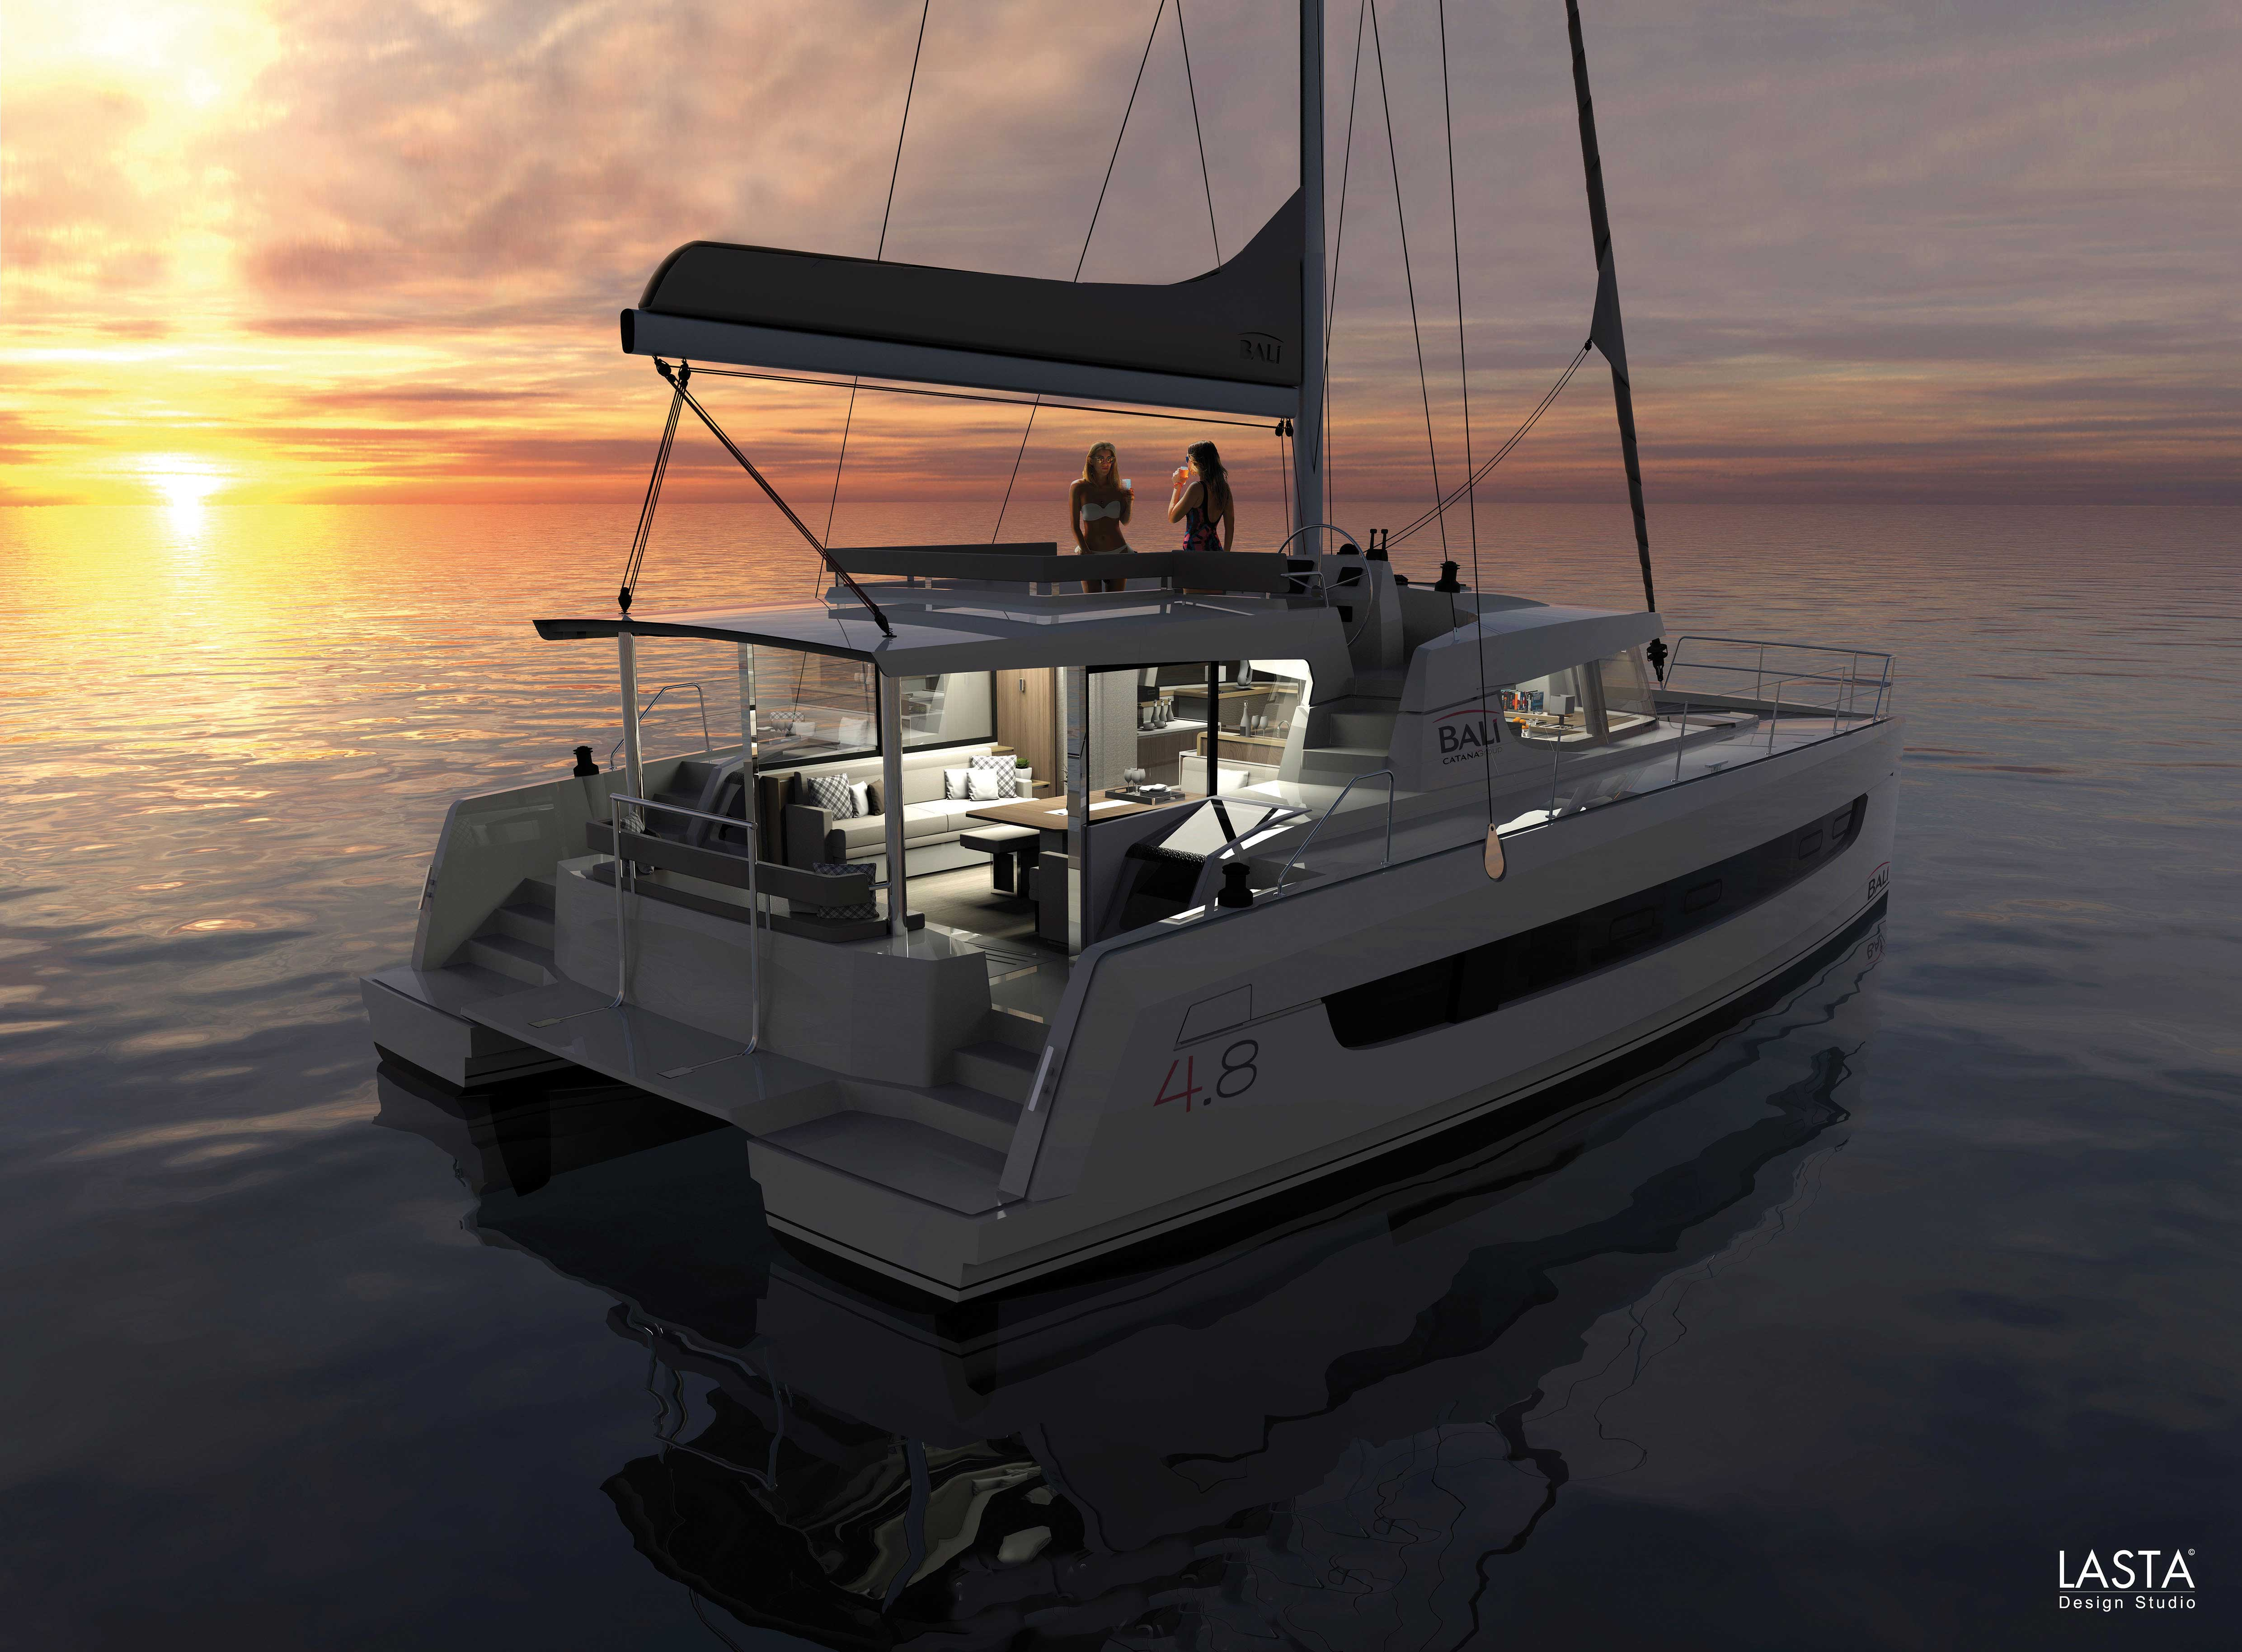 BALI catamarans, pleasure and sensations, break the rules!